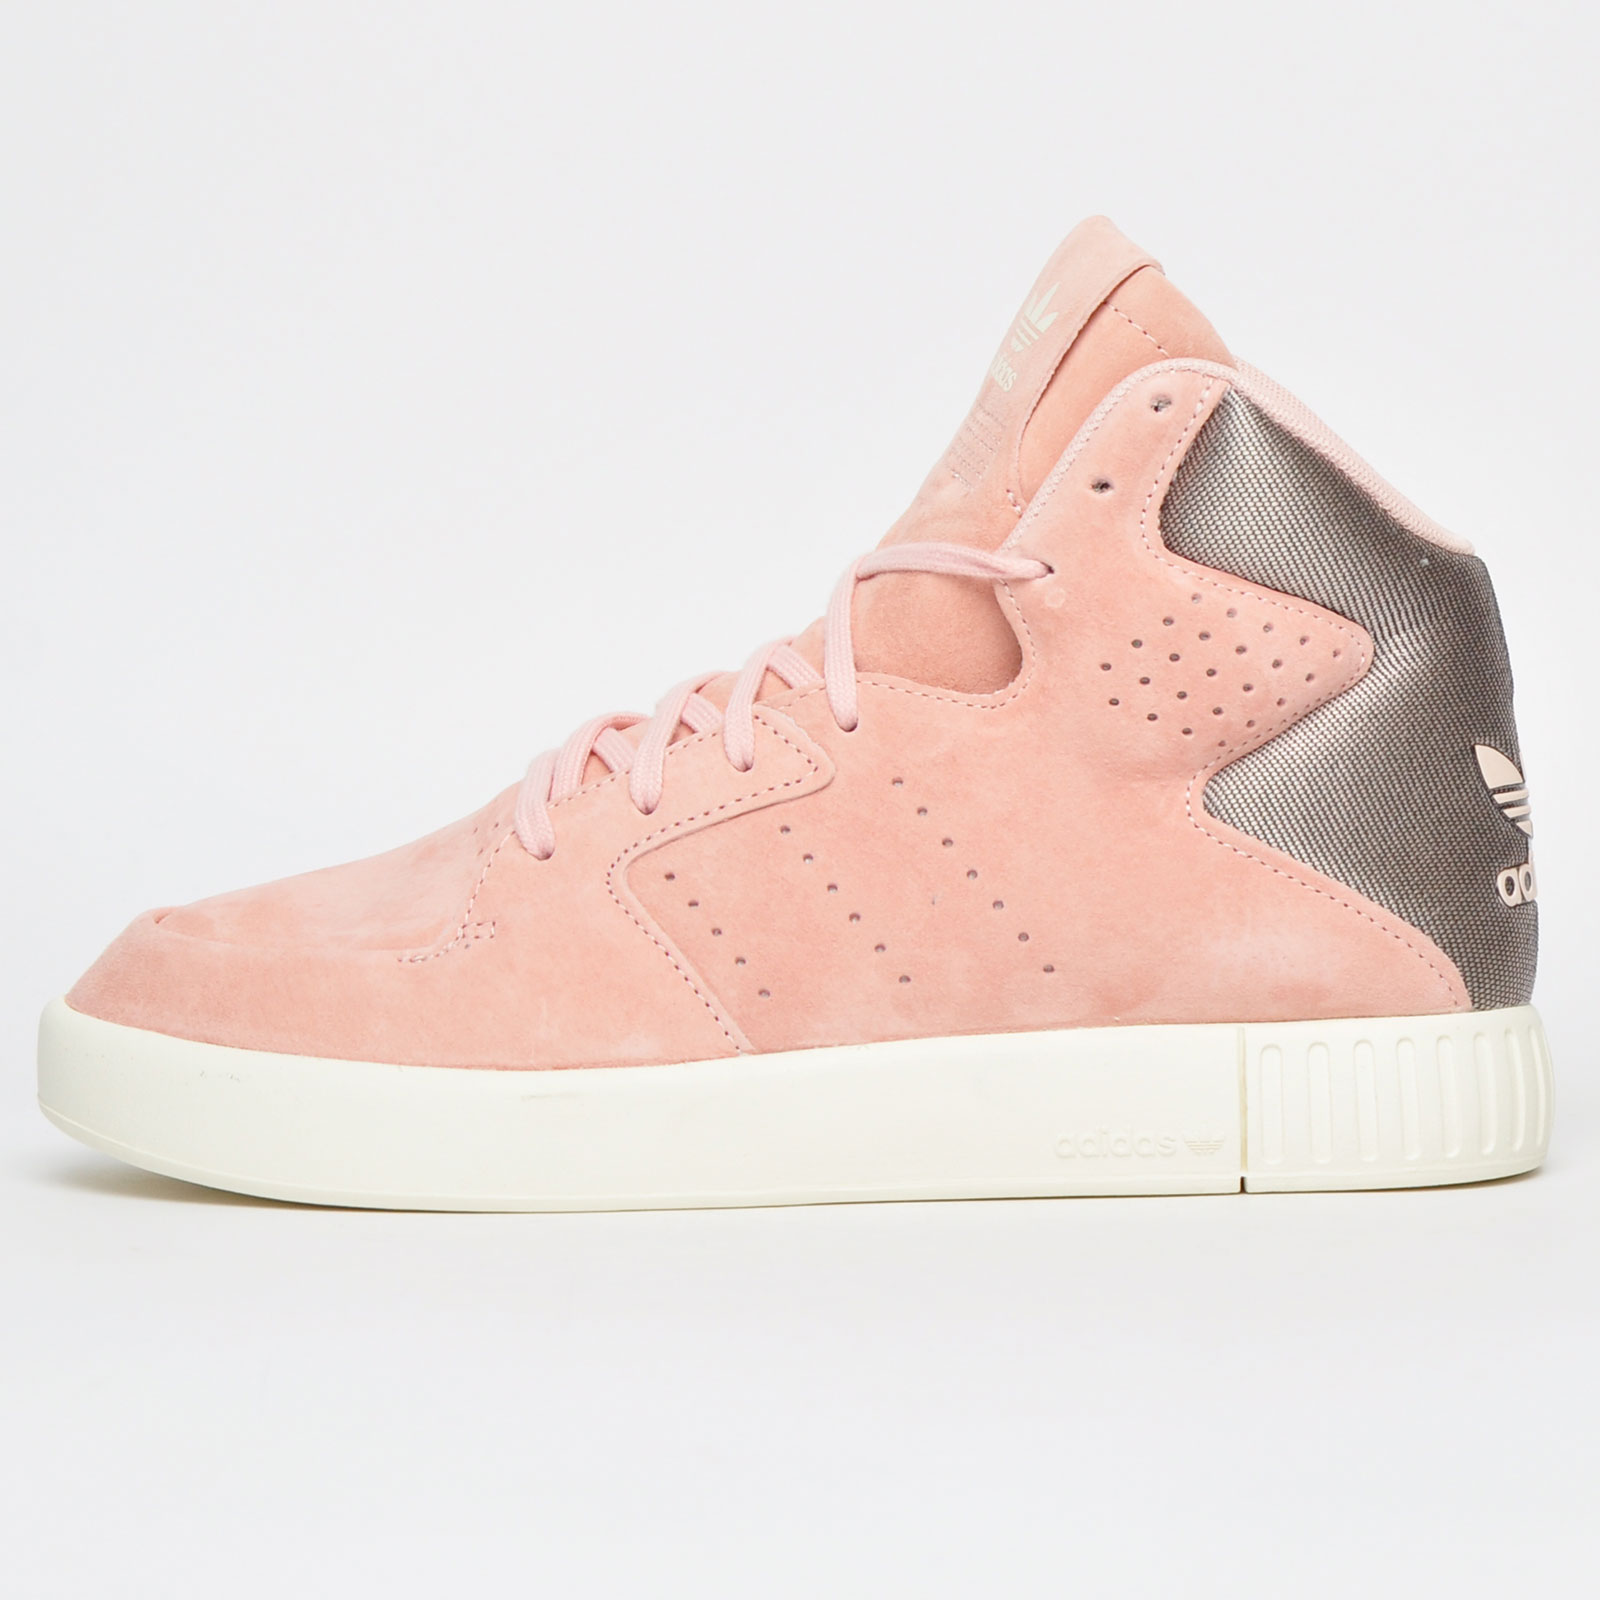 best service 8db08 917d5 Adidas Originals Tubular Invader 2.0 Women s Girls Hi Top Casual Fashion  Trainers Pink